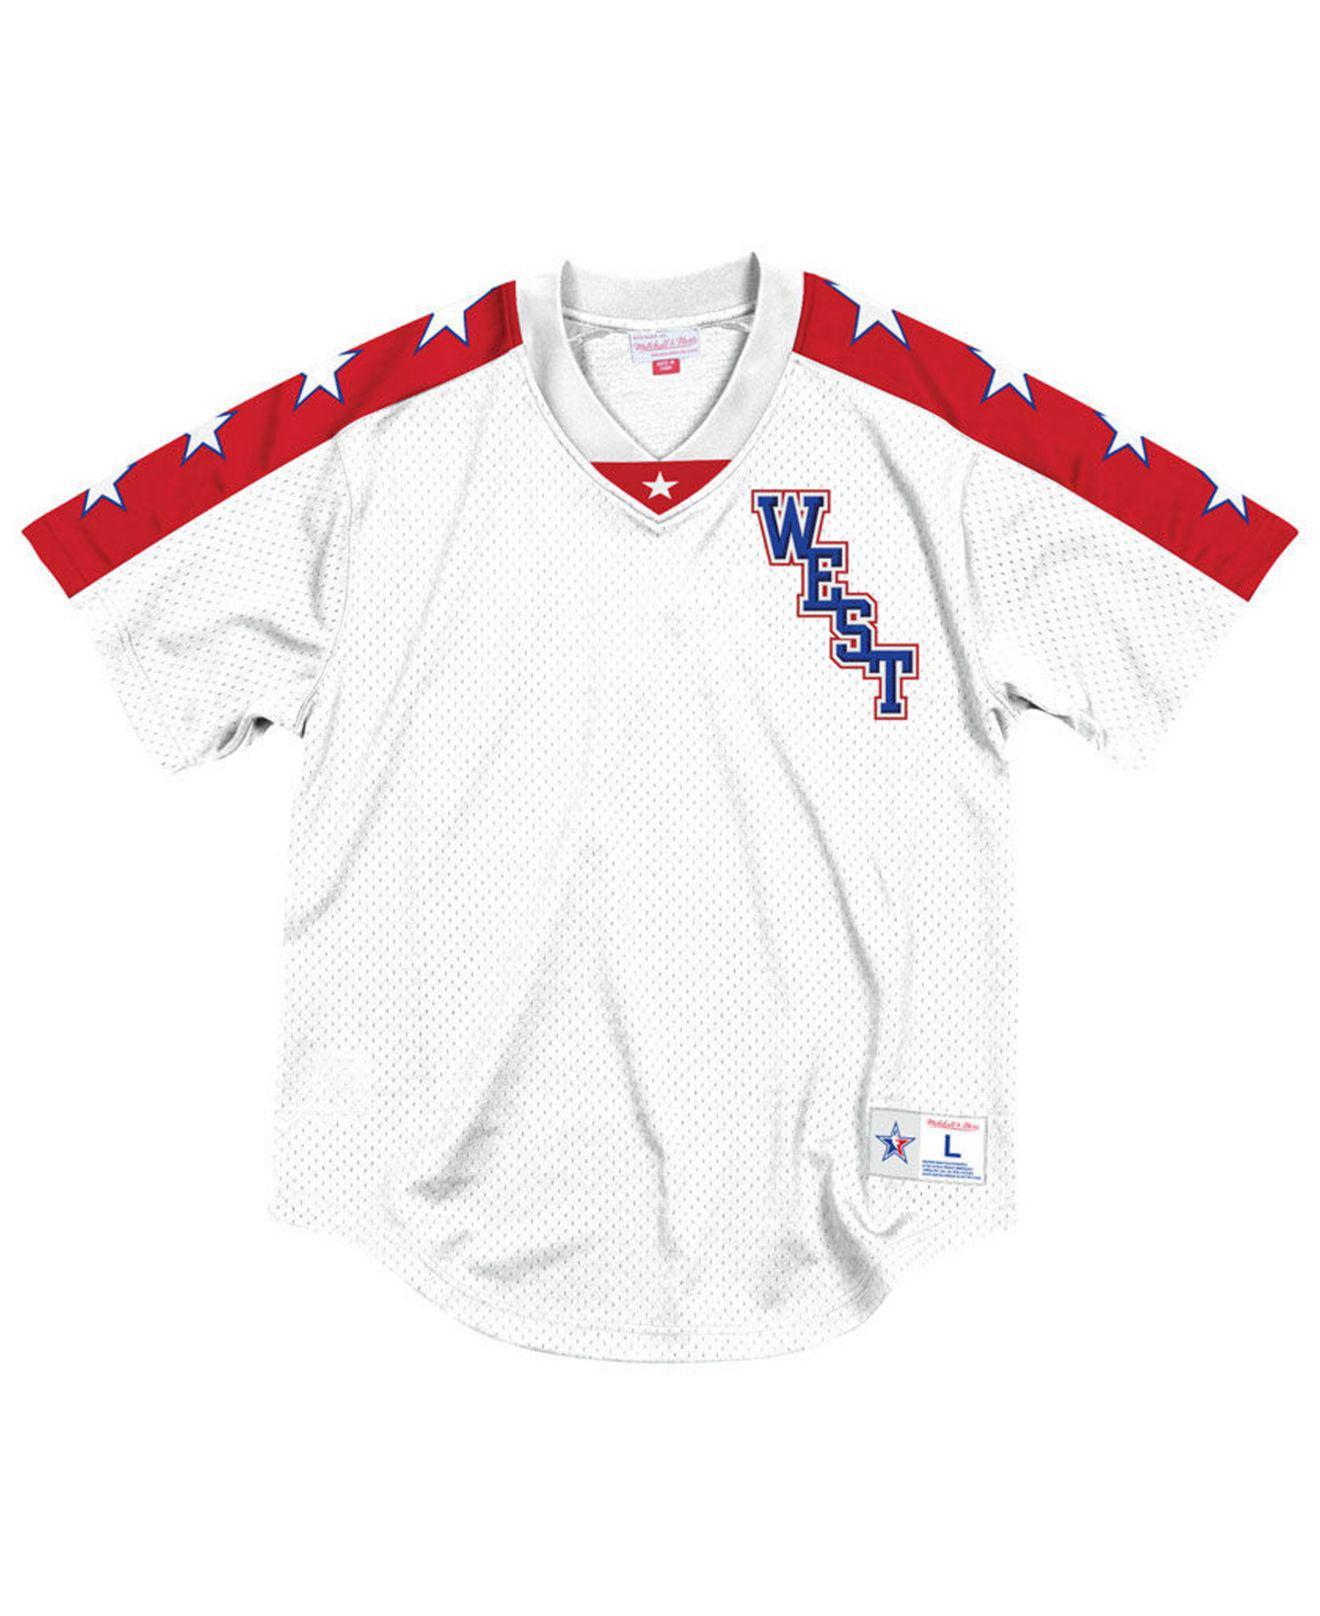 ... seasoned pro mesh button front jersey 0484d da882  germany mitchell ness.  mens white nba all star mesh v neck jersey 655e2 70ca3 74a9fc6eb